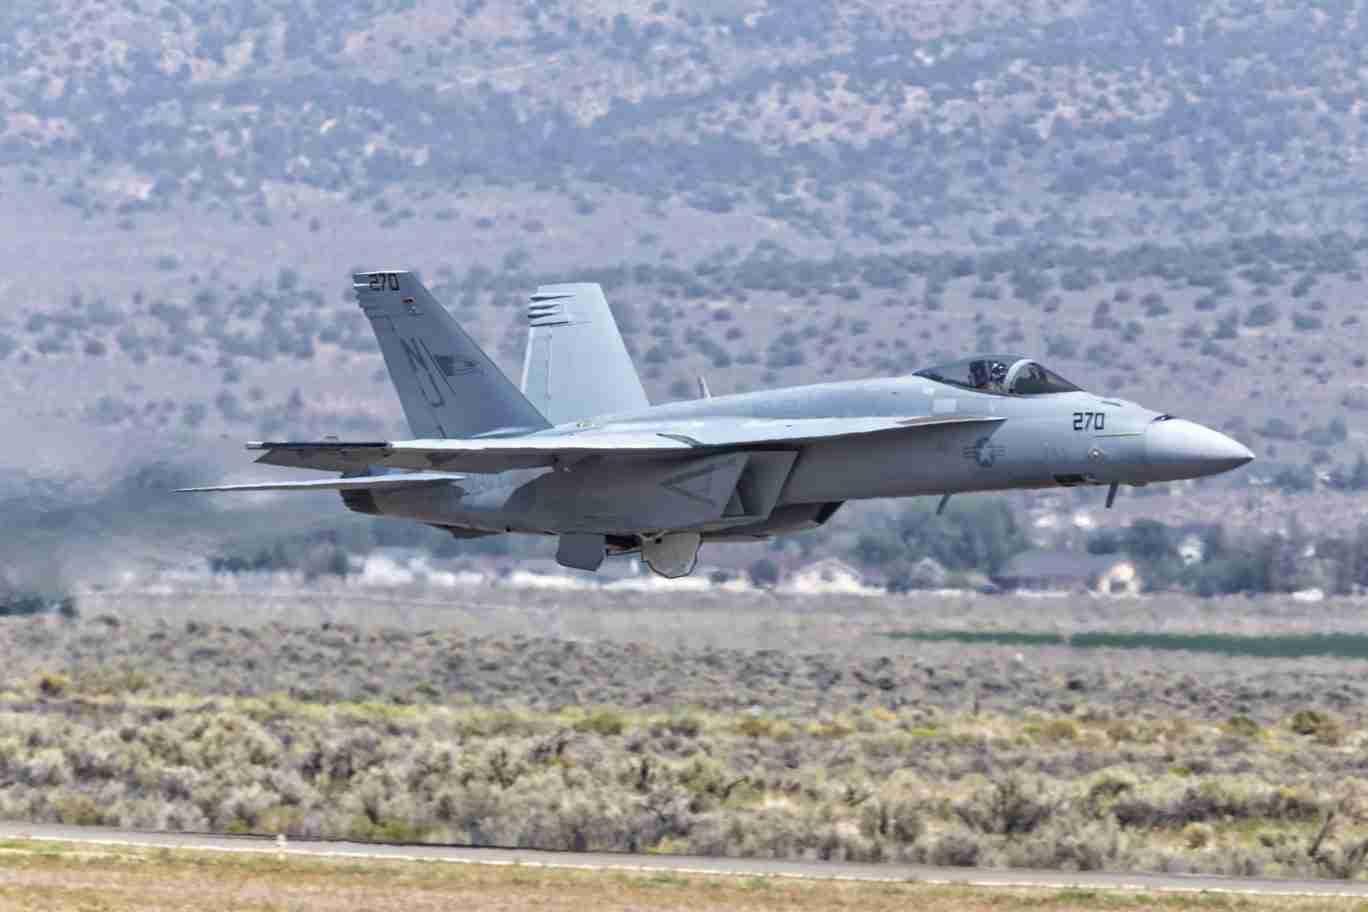 F/A-18 Super Hornet at Low Altitude